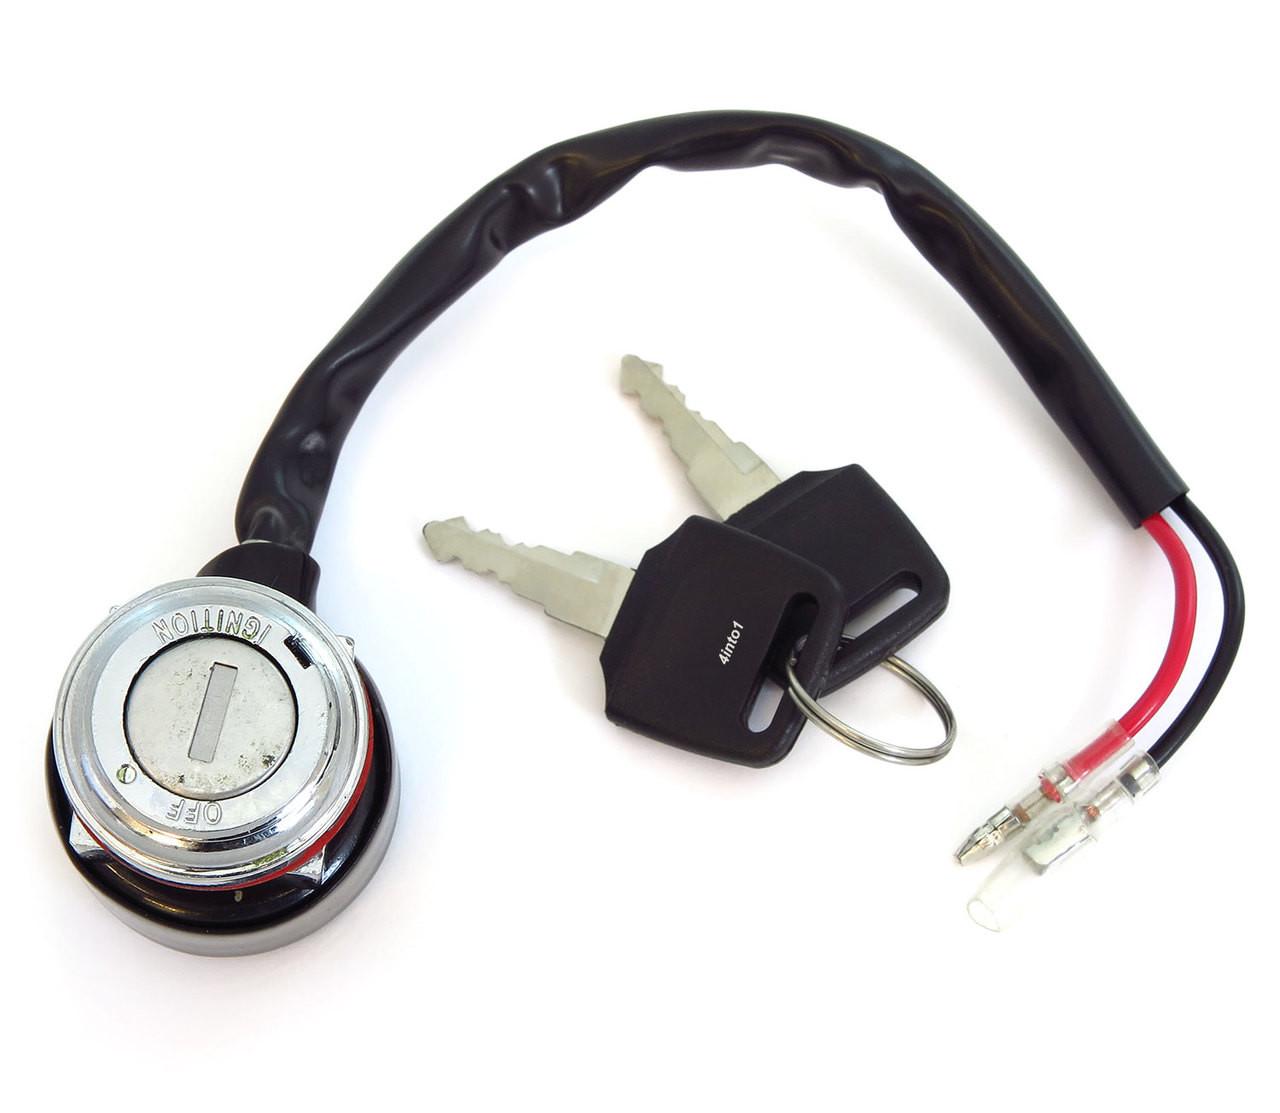 Ignition Switch - 35100-324-761 - Honda CL70 CB/CL/SL/XL100 CL/SL125